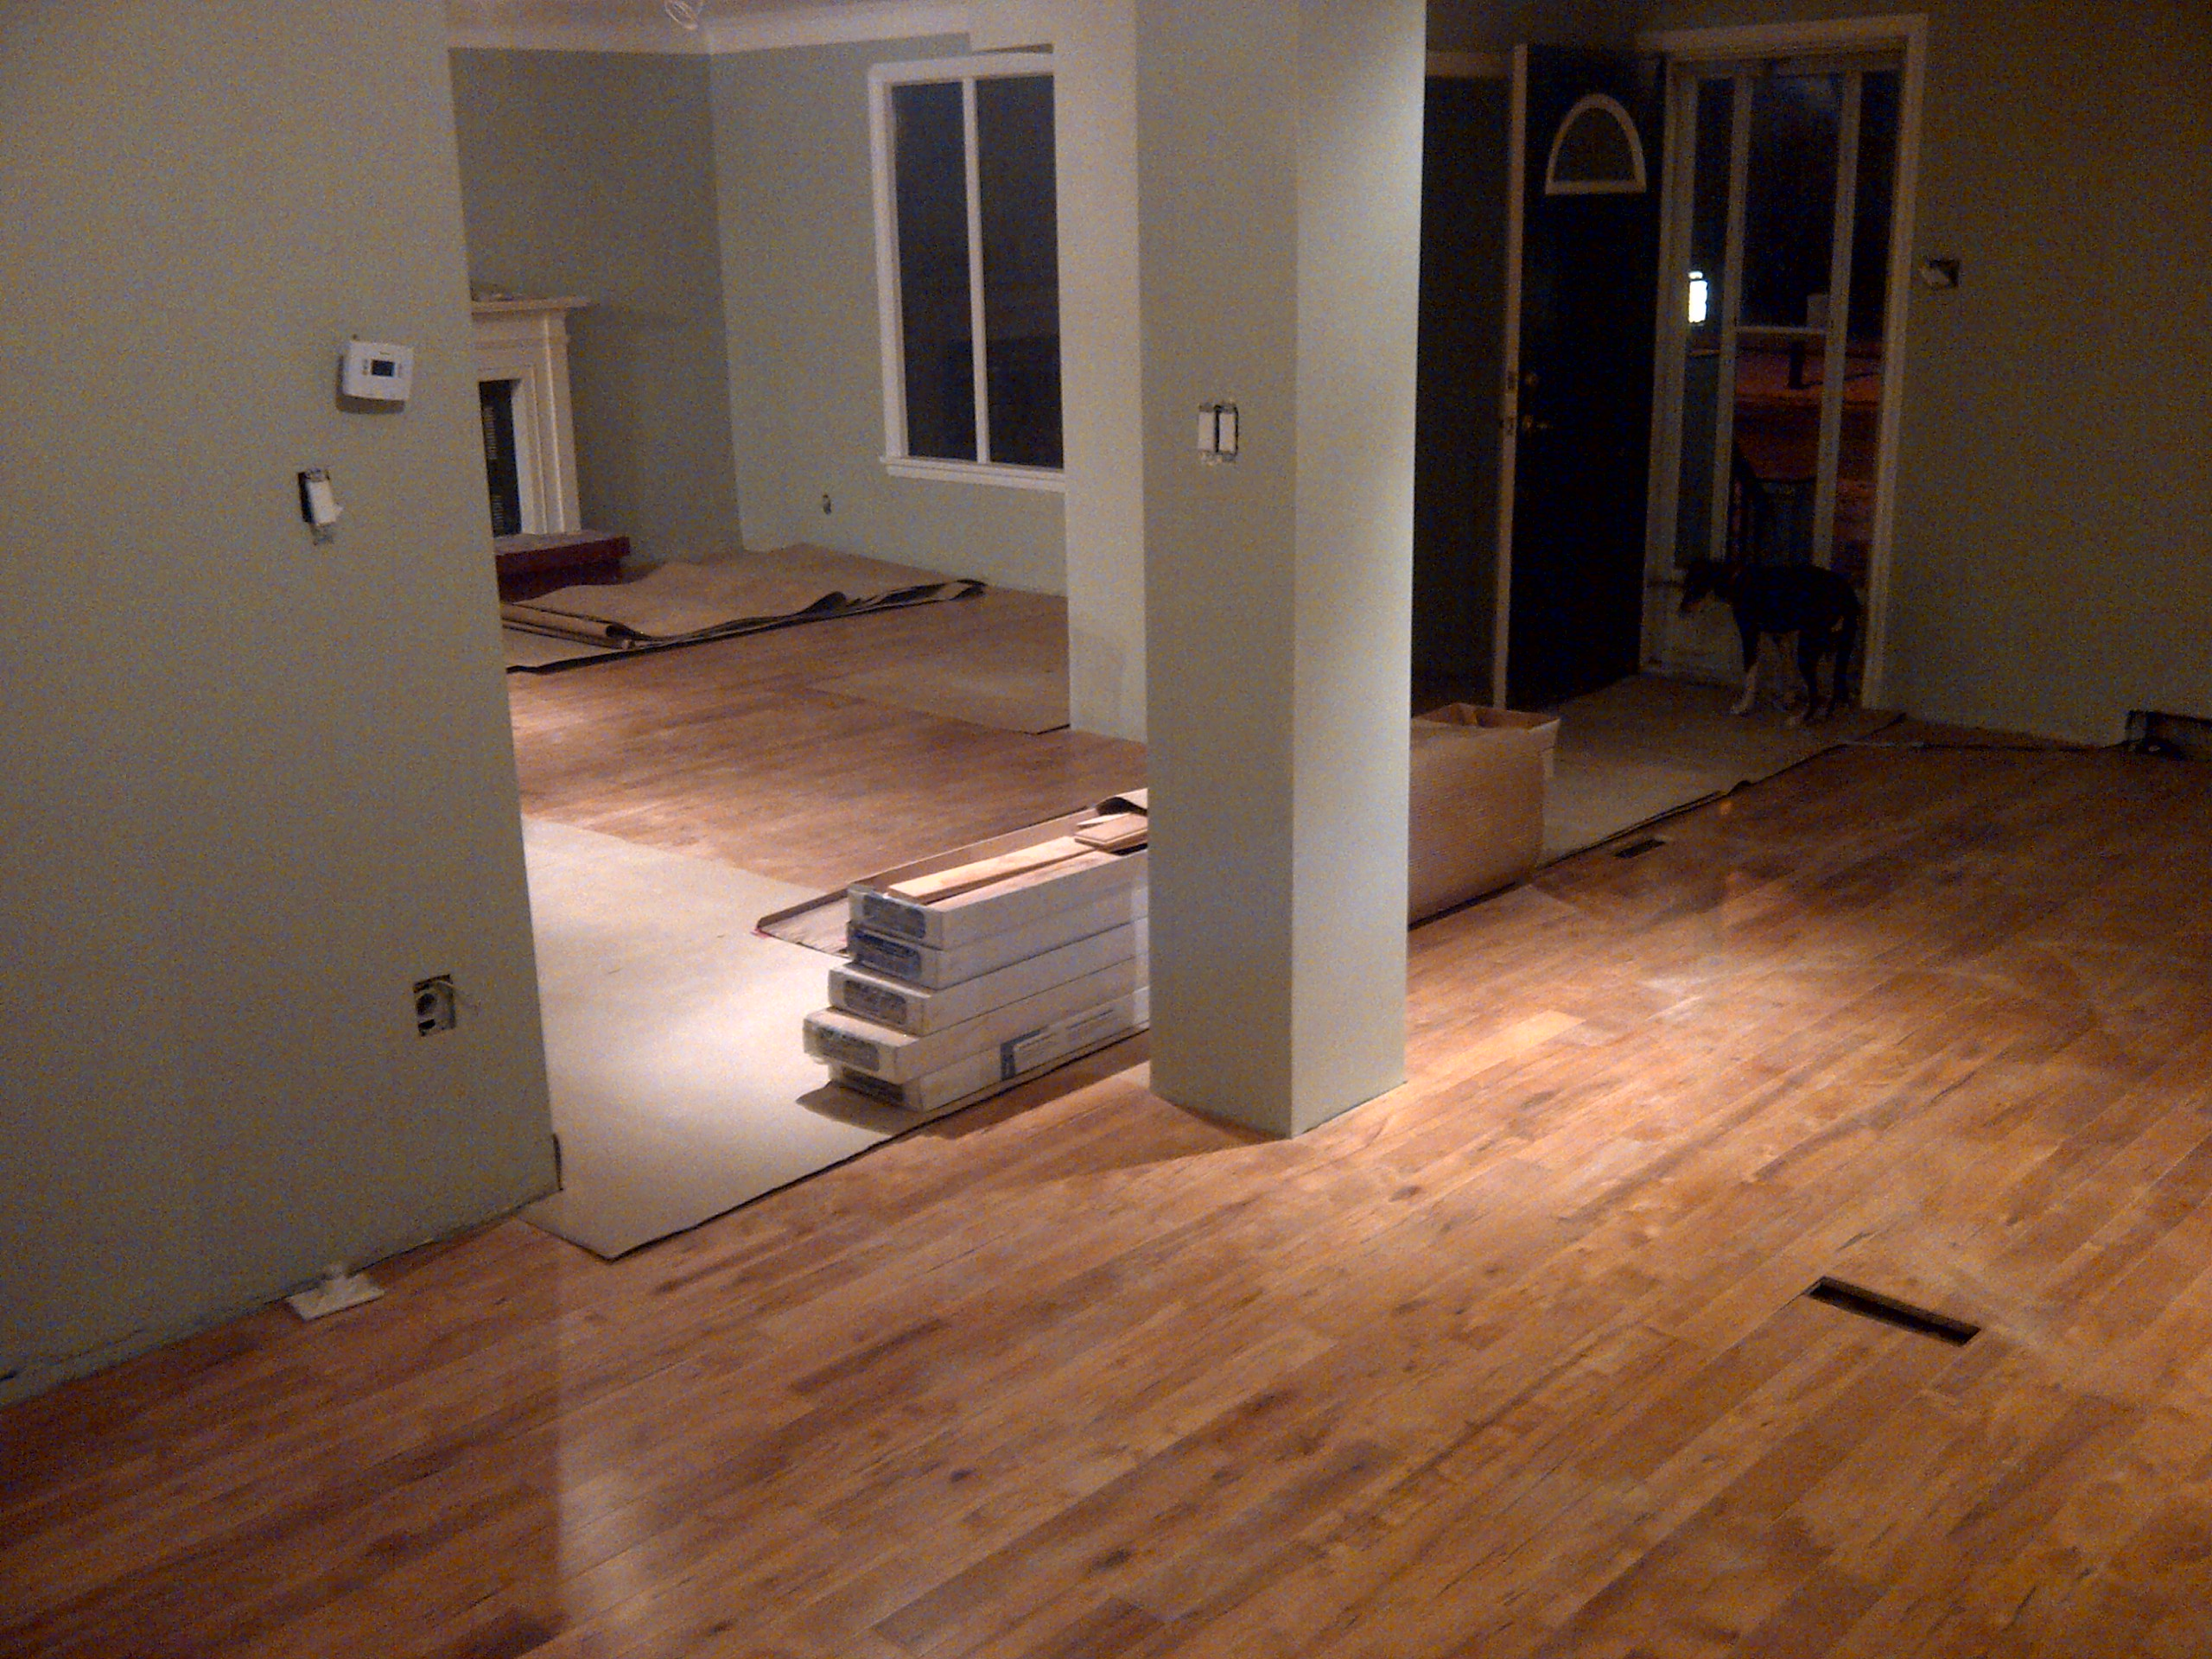 Main floor painting